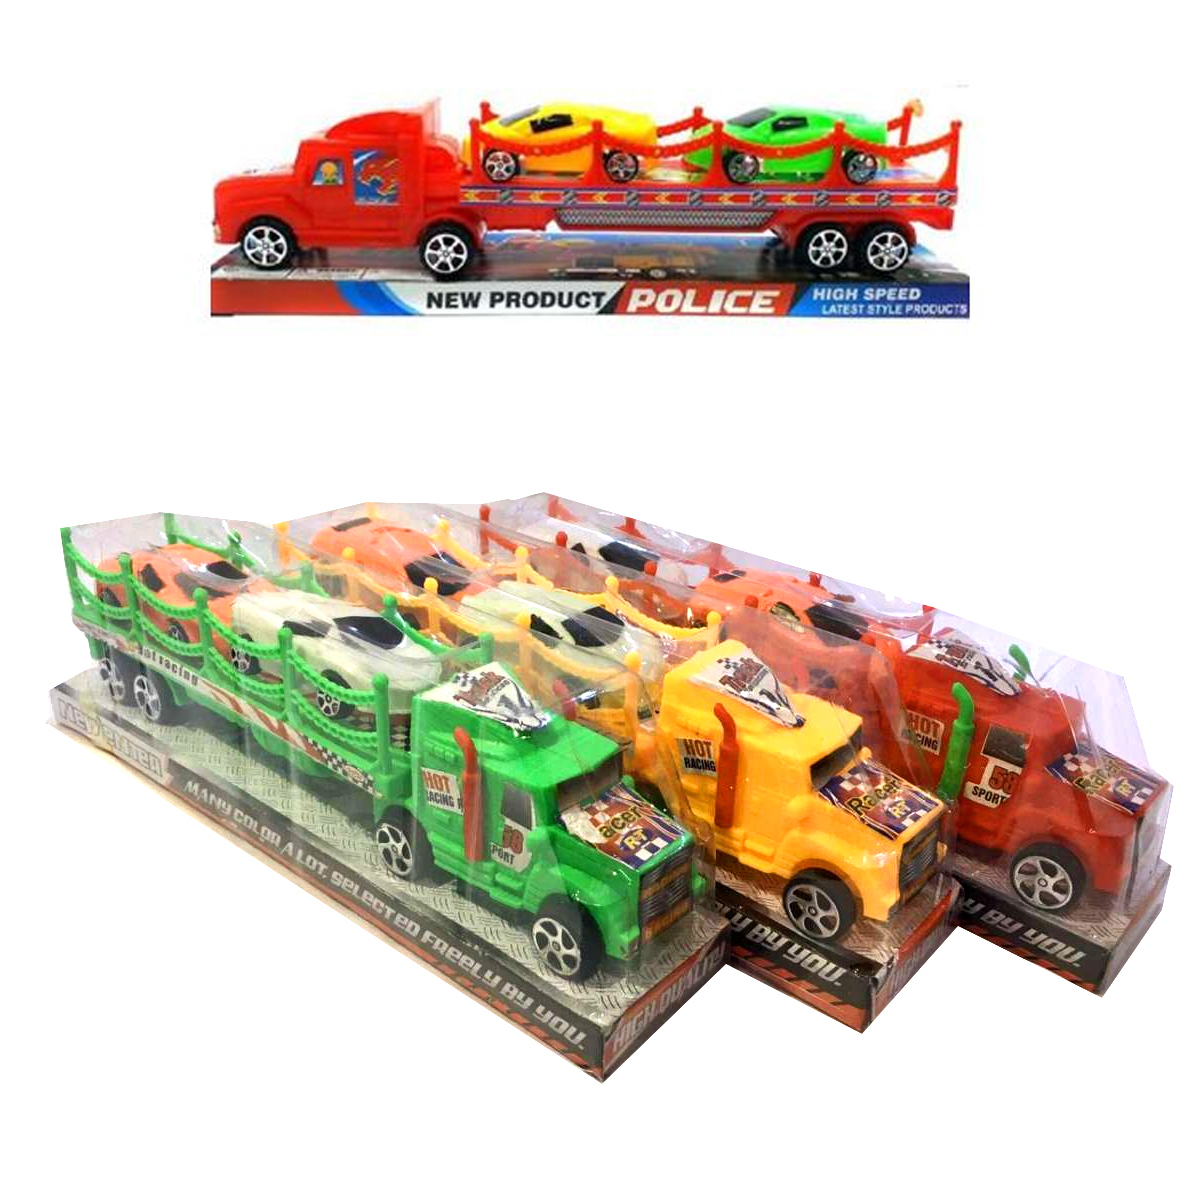 Racer Truck Toys Set For Kids, Boys, - Car Transporter Truck With 2 Car